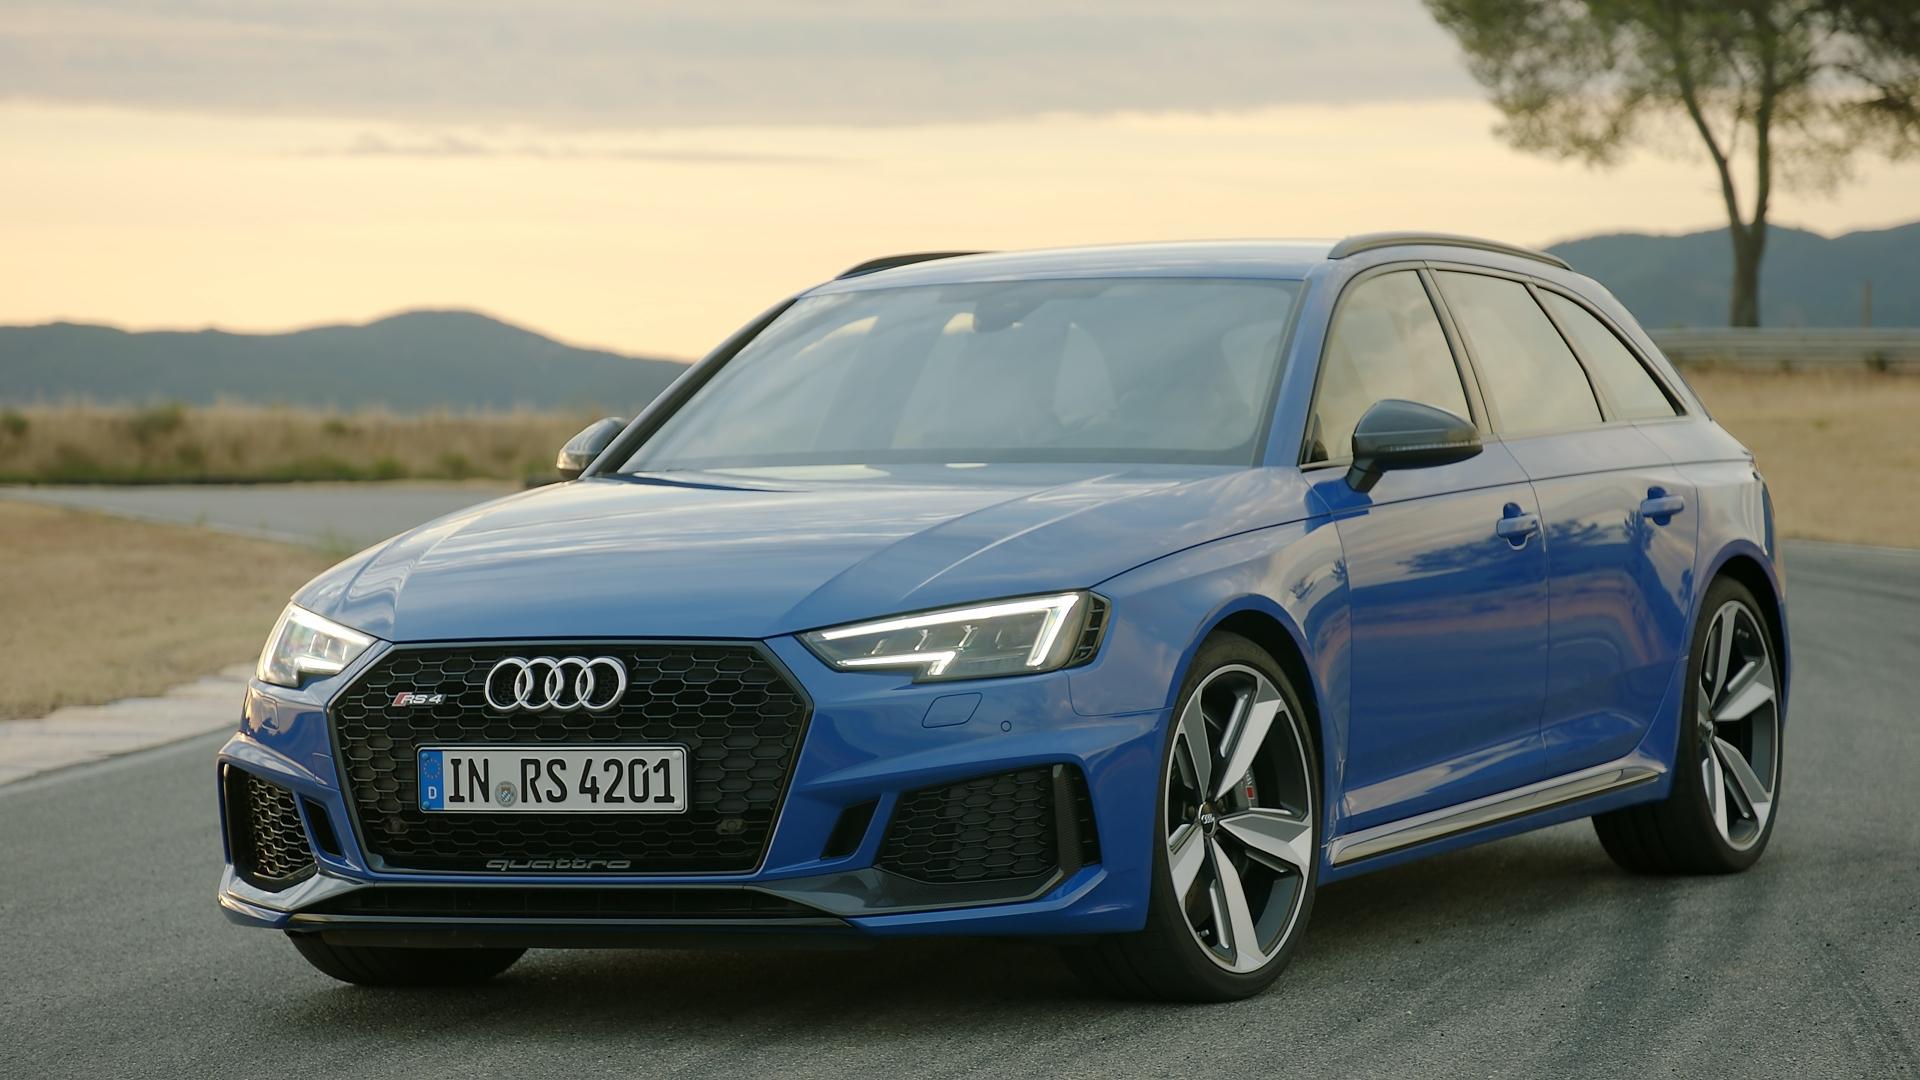 Audi RS 4 Avant (2017): Rückkehr der RS-Ikone